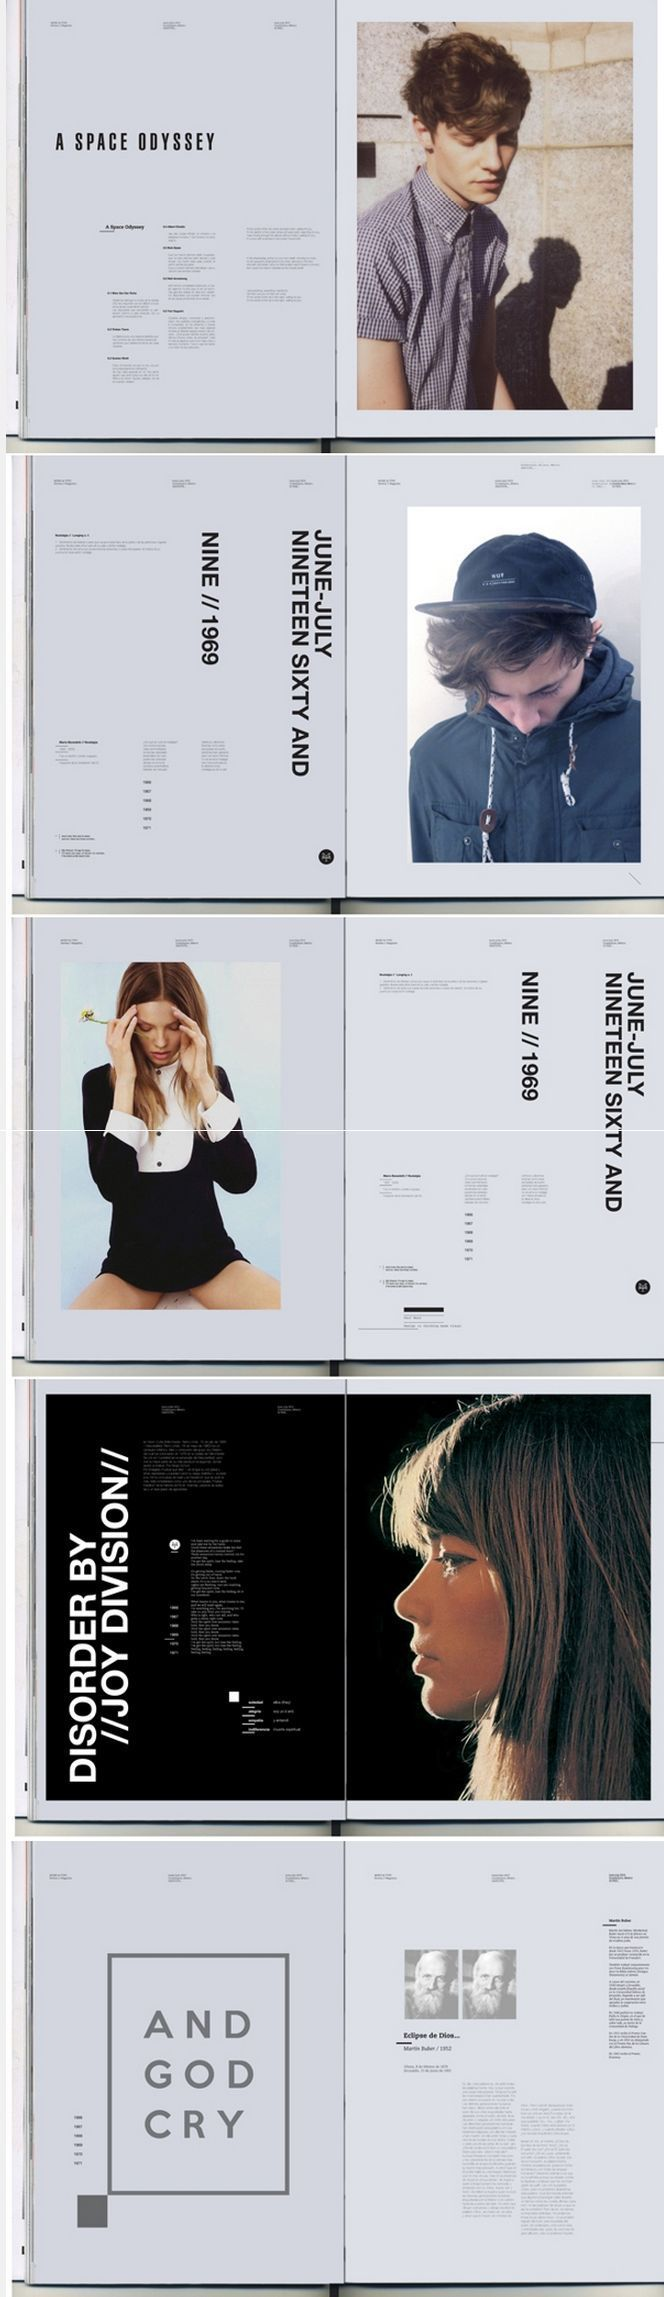 layout - Compo / Charte graphique   Pinterest - Ontwerp, Grafisch ...